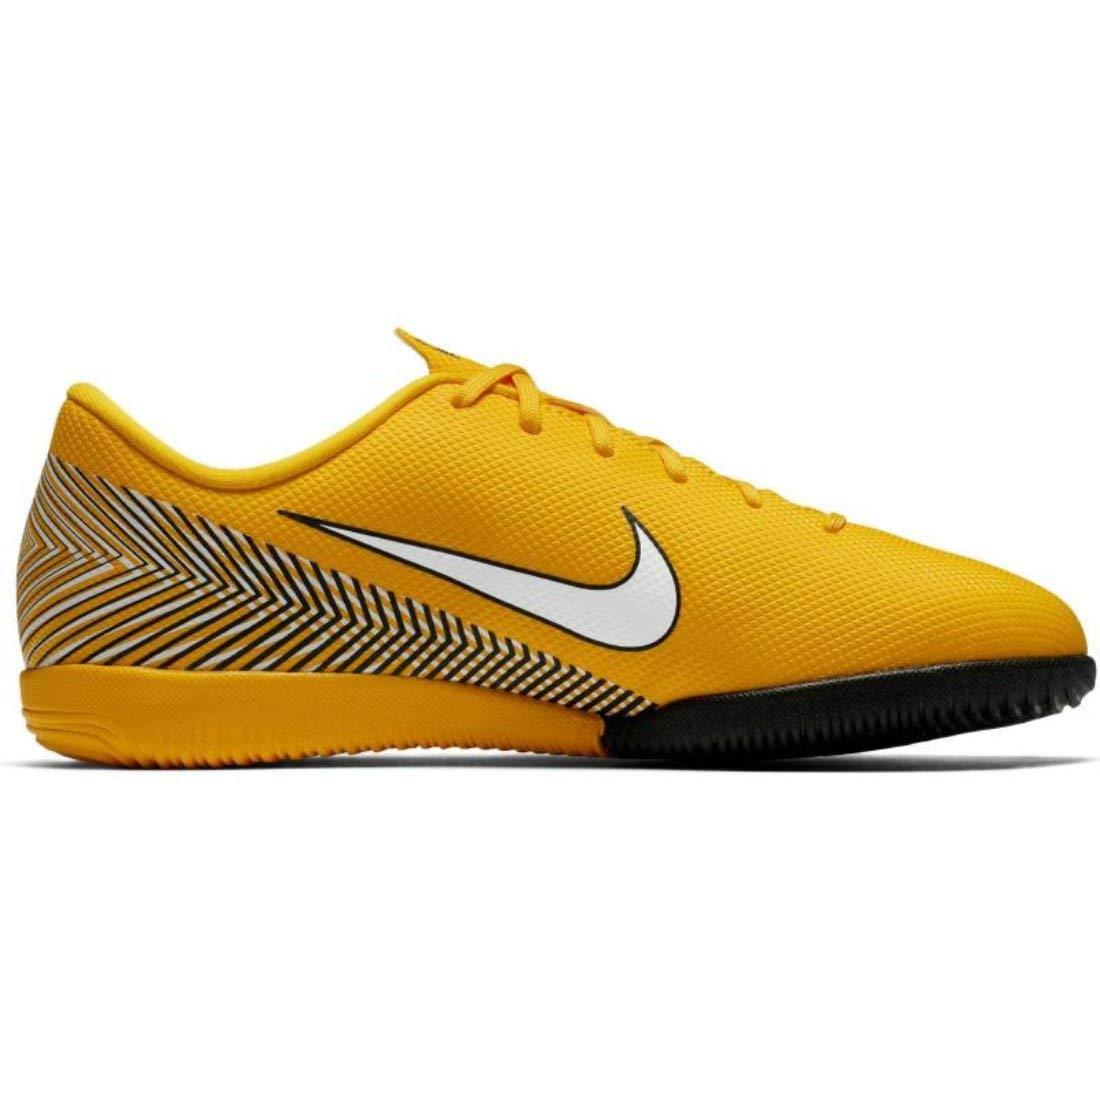 d5545cfae Amazon.com | Nike Jr. Vapor XII Academy Neymar Jr IC Little/Big Kids'  Indoor/Court Soccer Shoe | Soccer